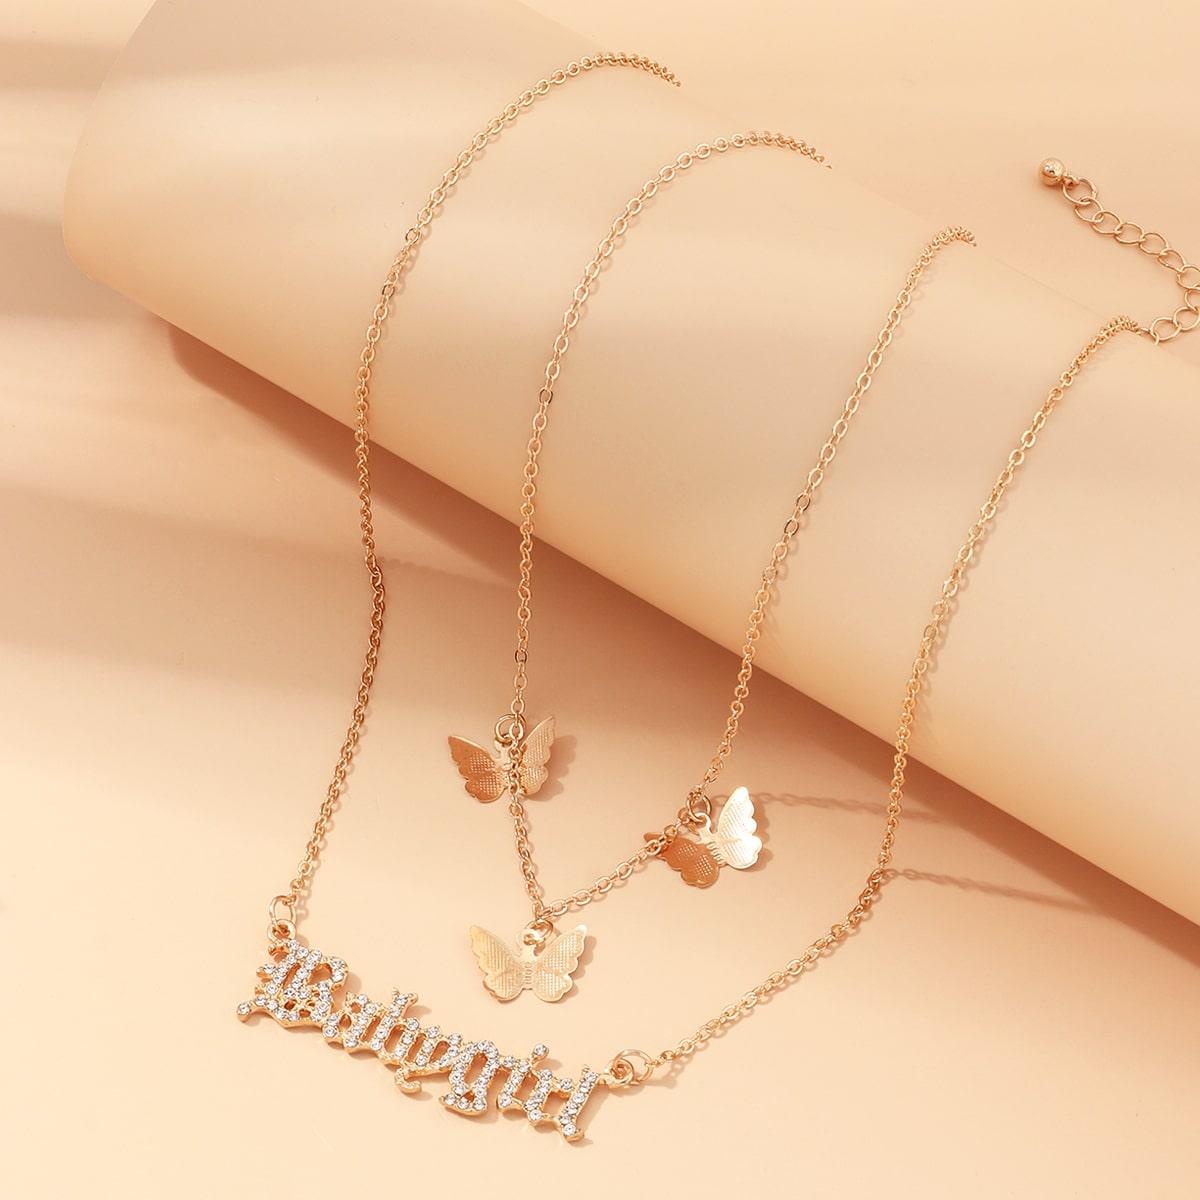 2шт ожерелье с бабочками фото